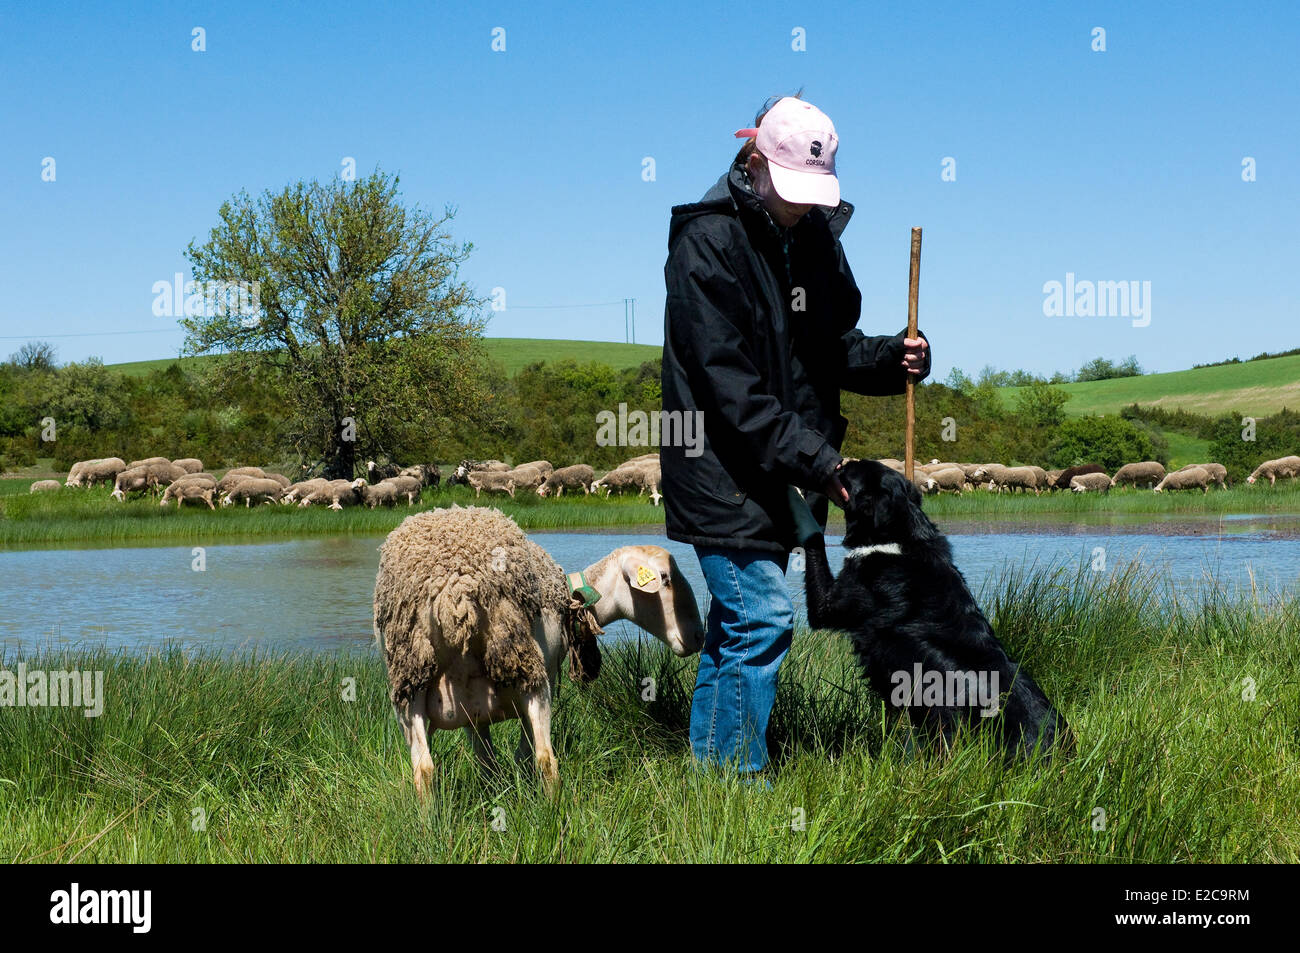 France, Aveyron, La Rouquette, the shepherd and his flock Severine Boudes - Stock Image